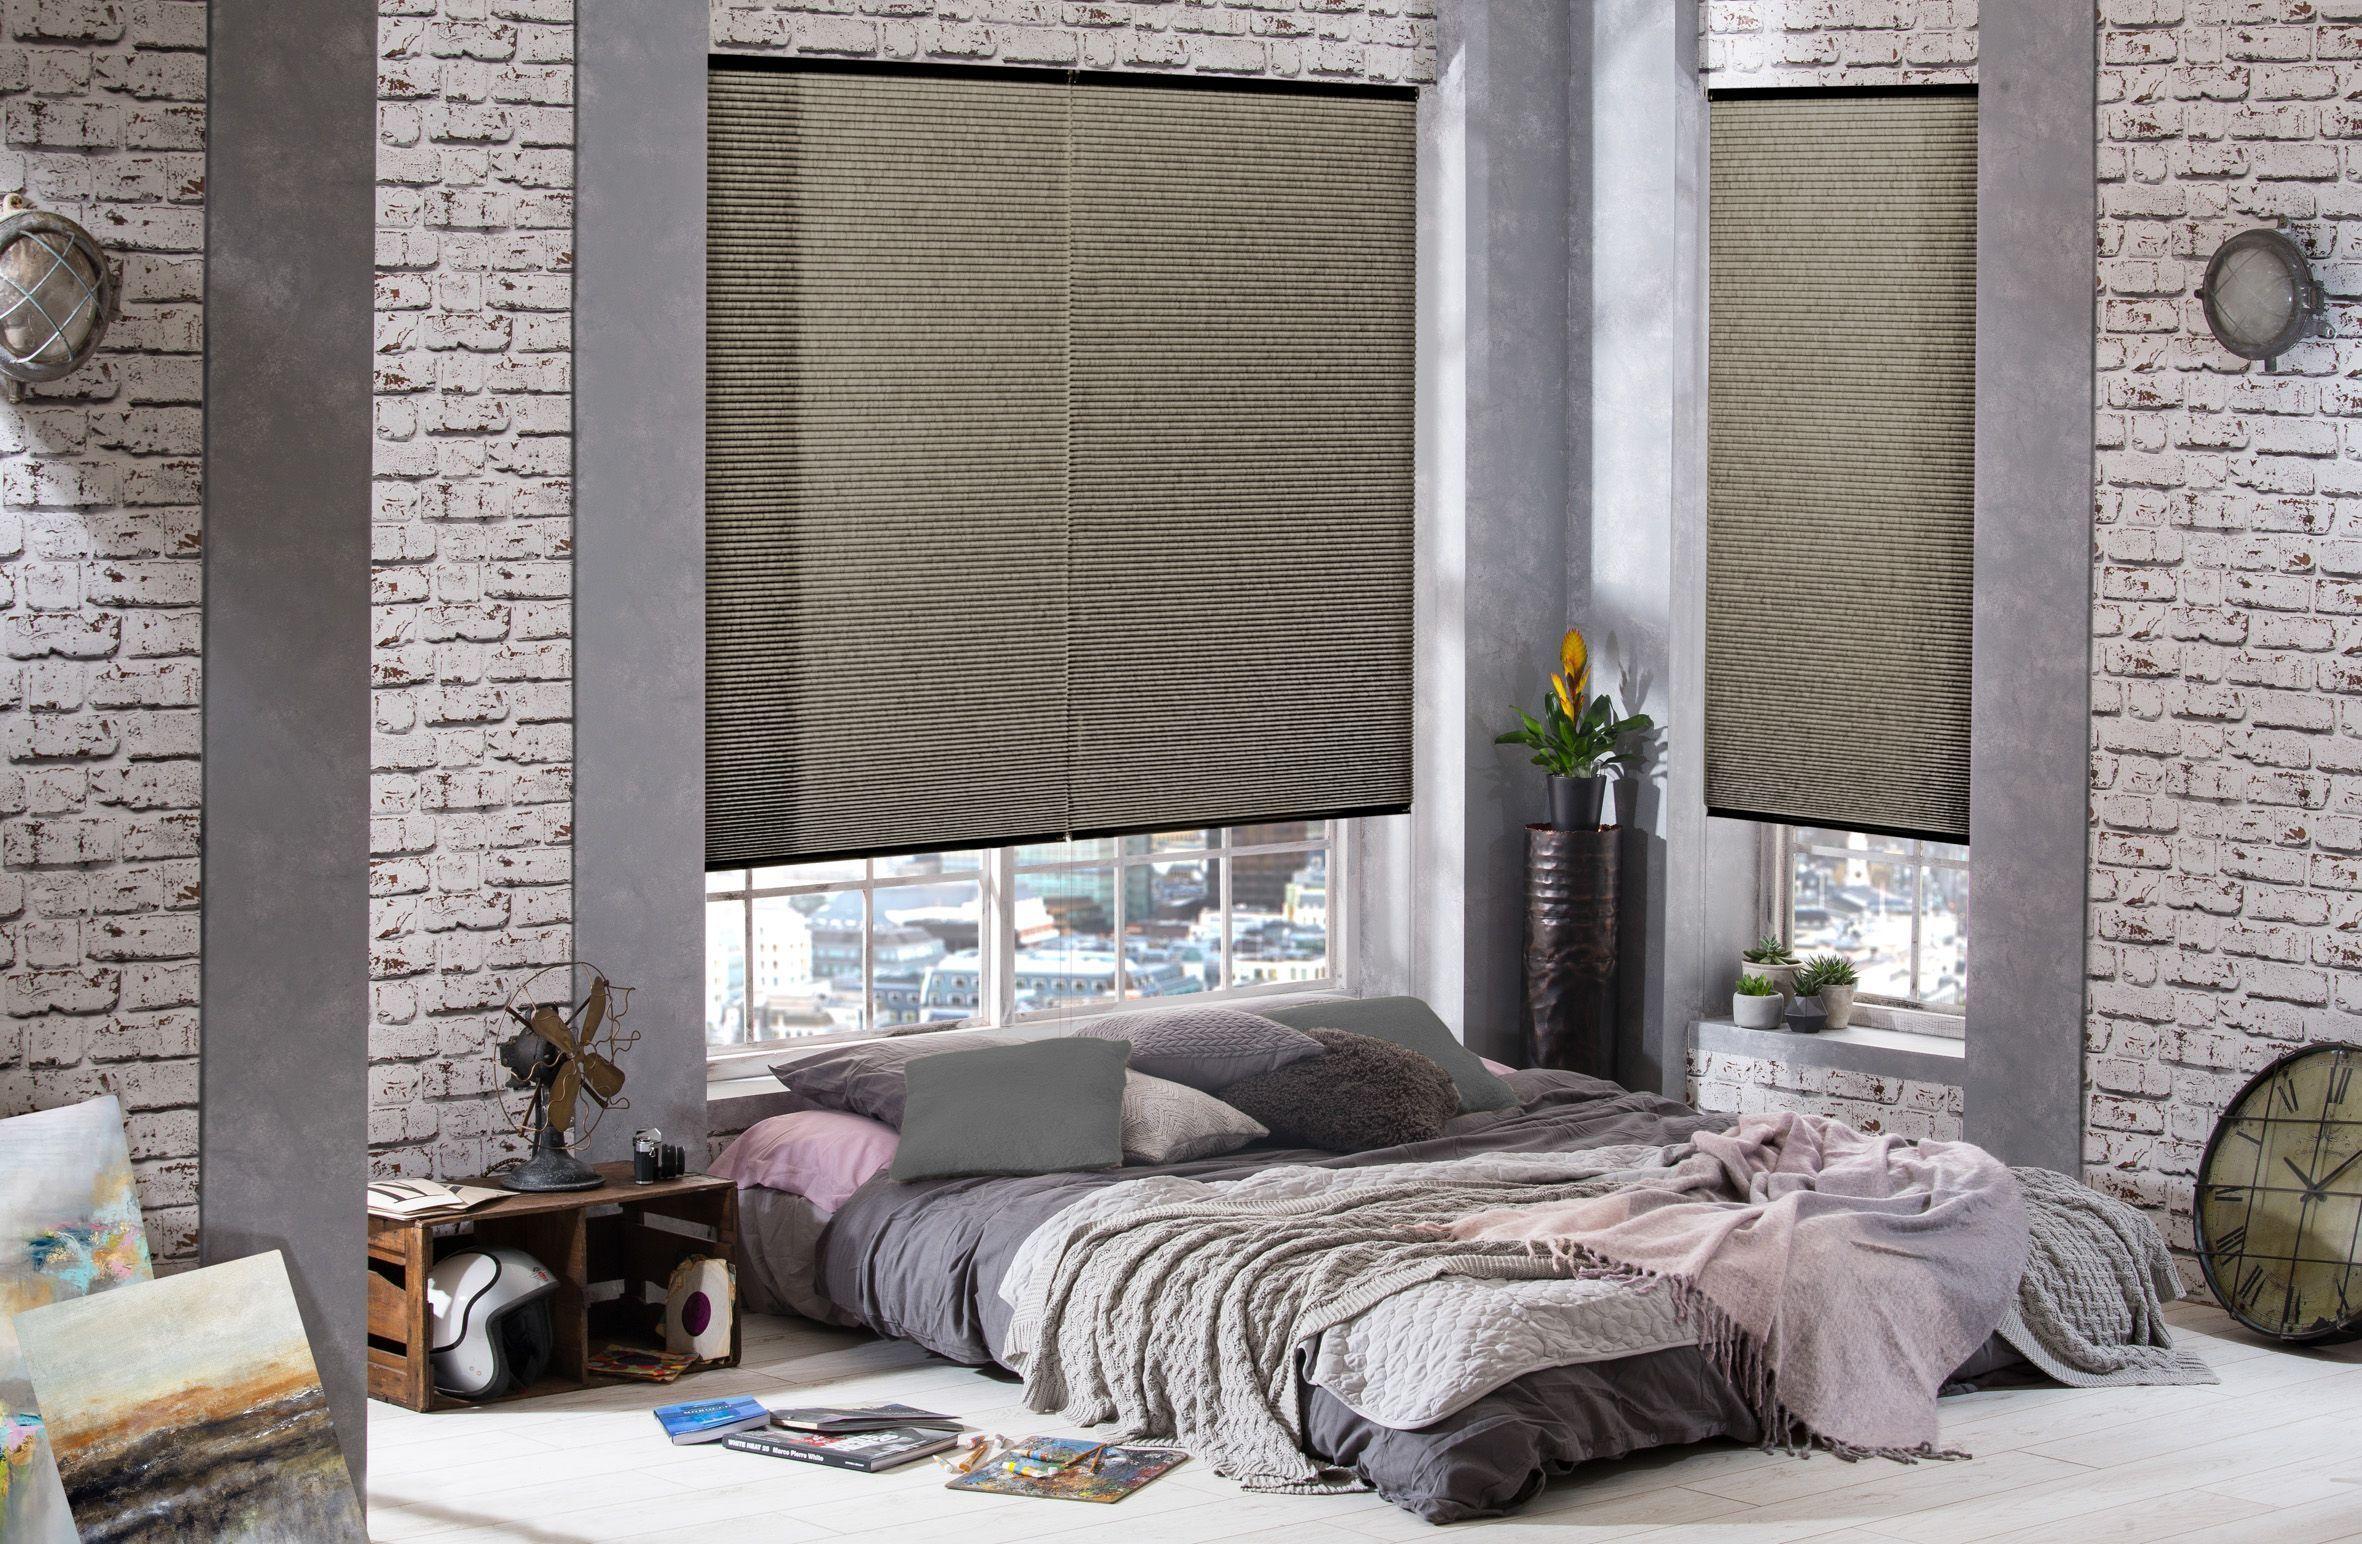 hive blinds from style studio grey blinds bedroom blinds modern rh pinterest com